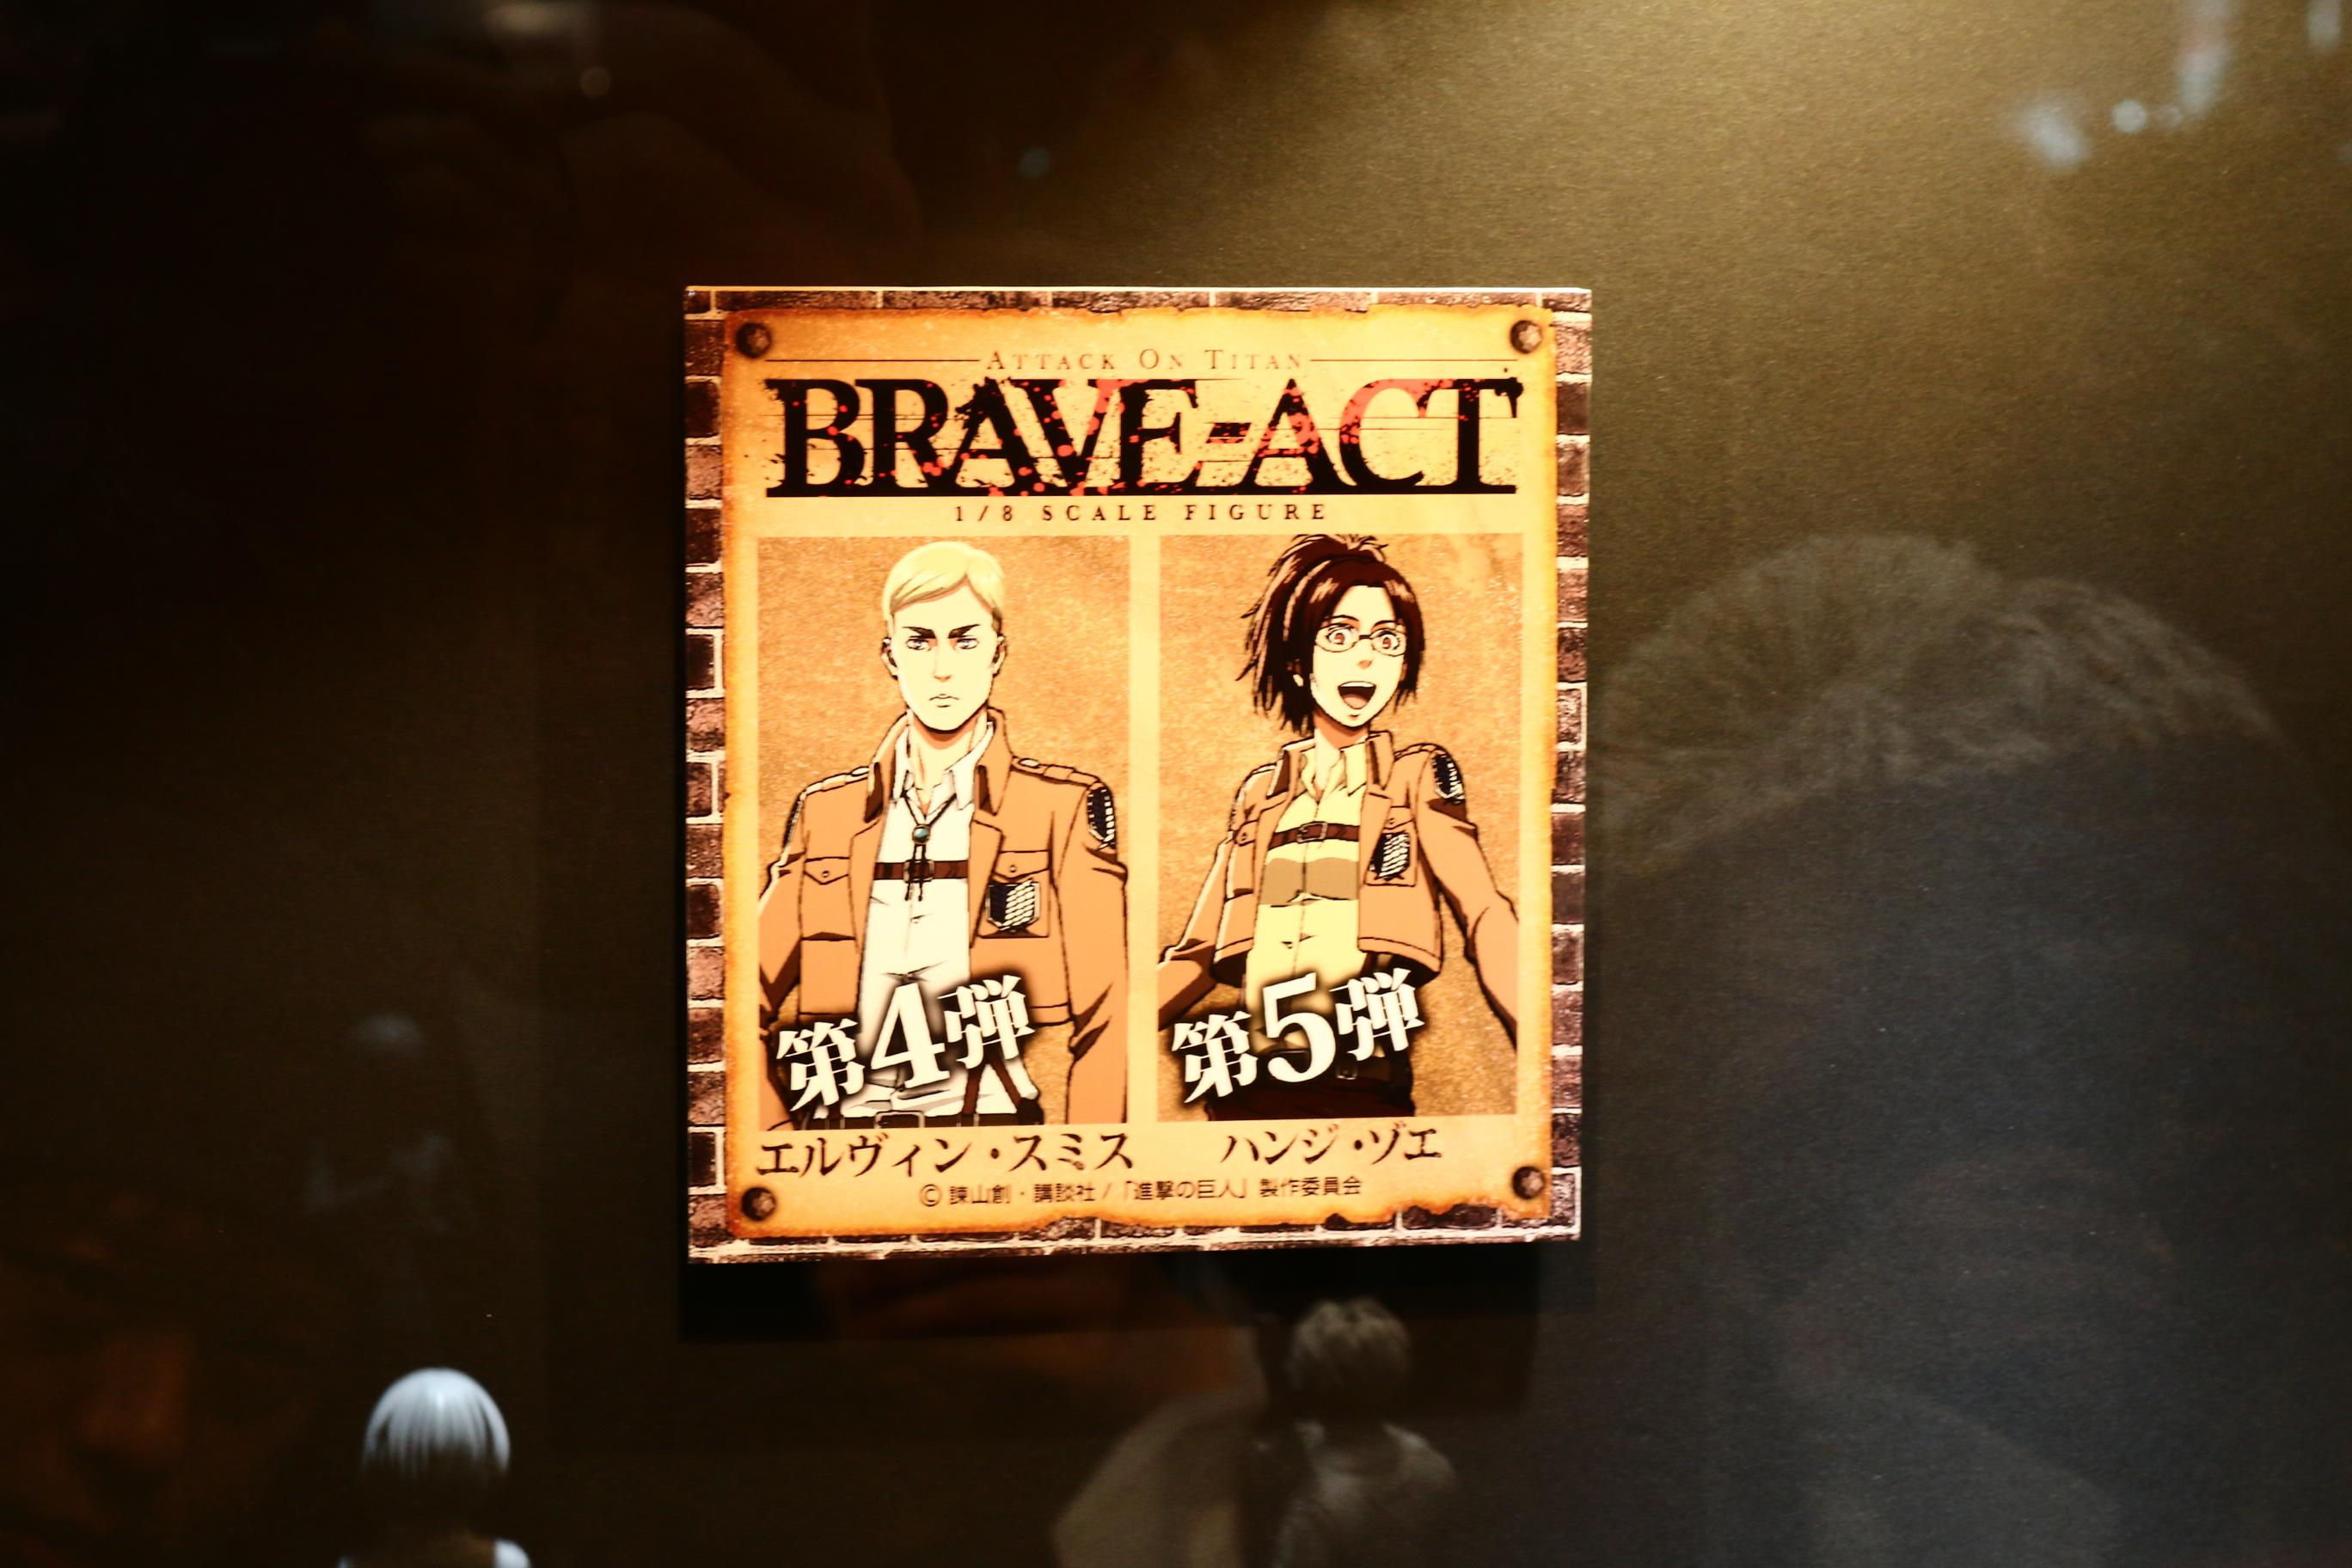 BRAVE-ACT 第4弾:エルヴィン/第5弾 ハンジ